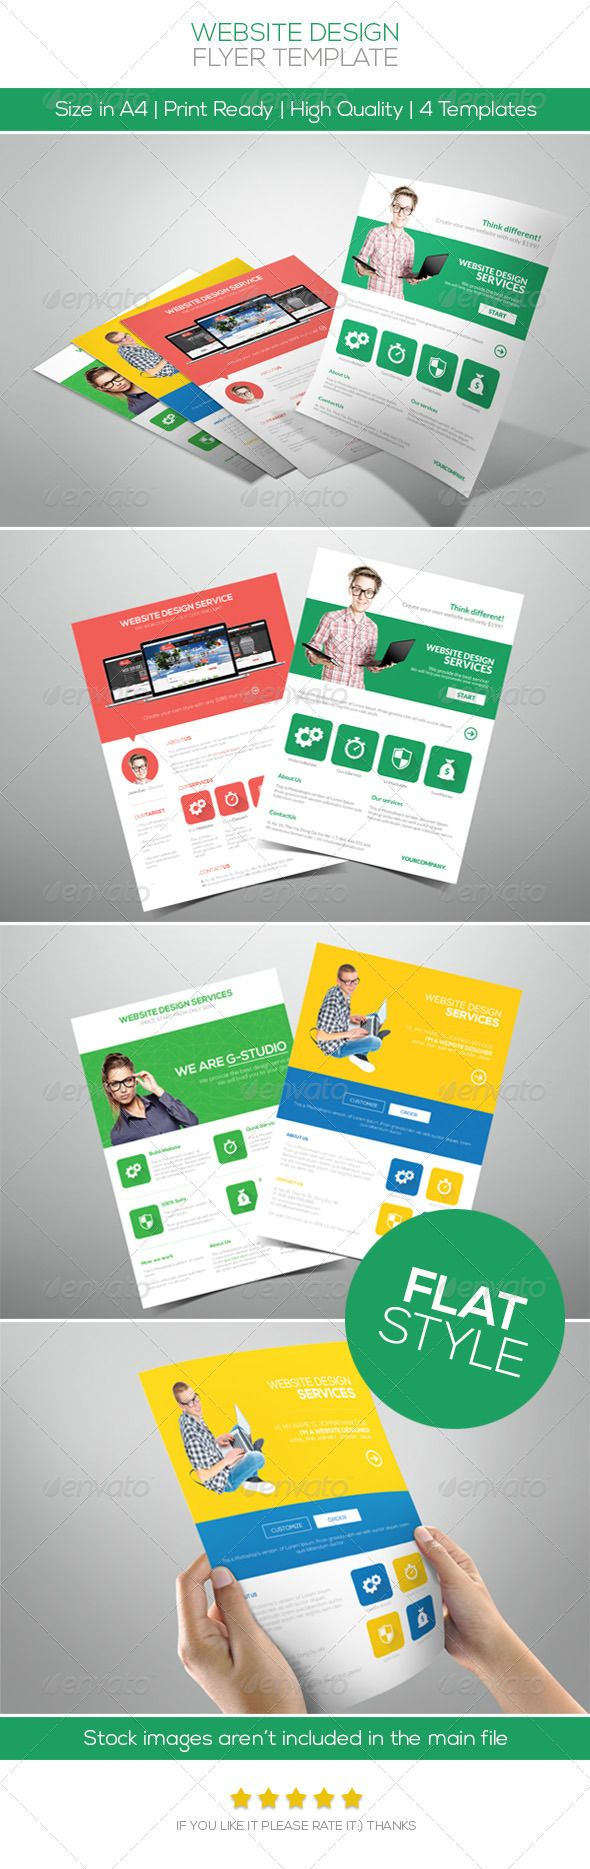 Flat Website Design Flyer